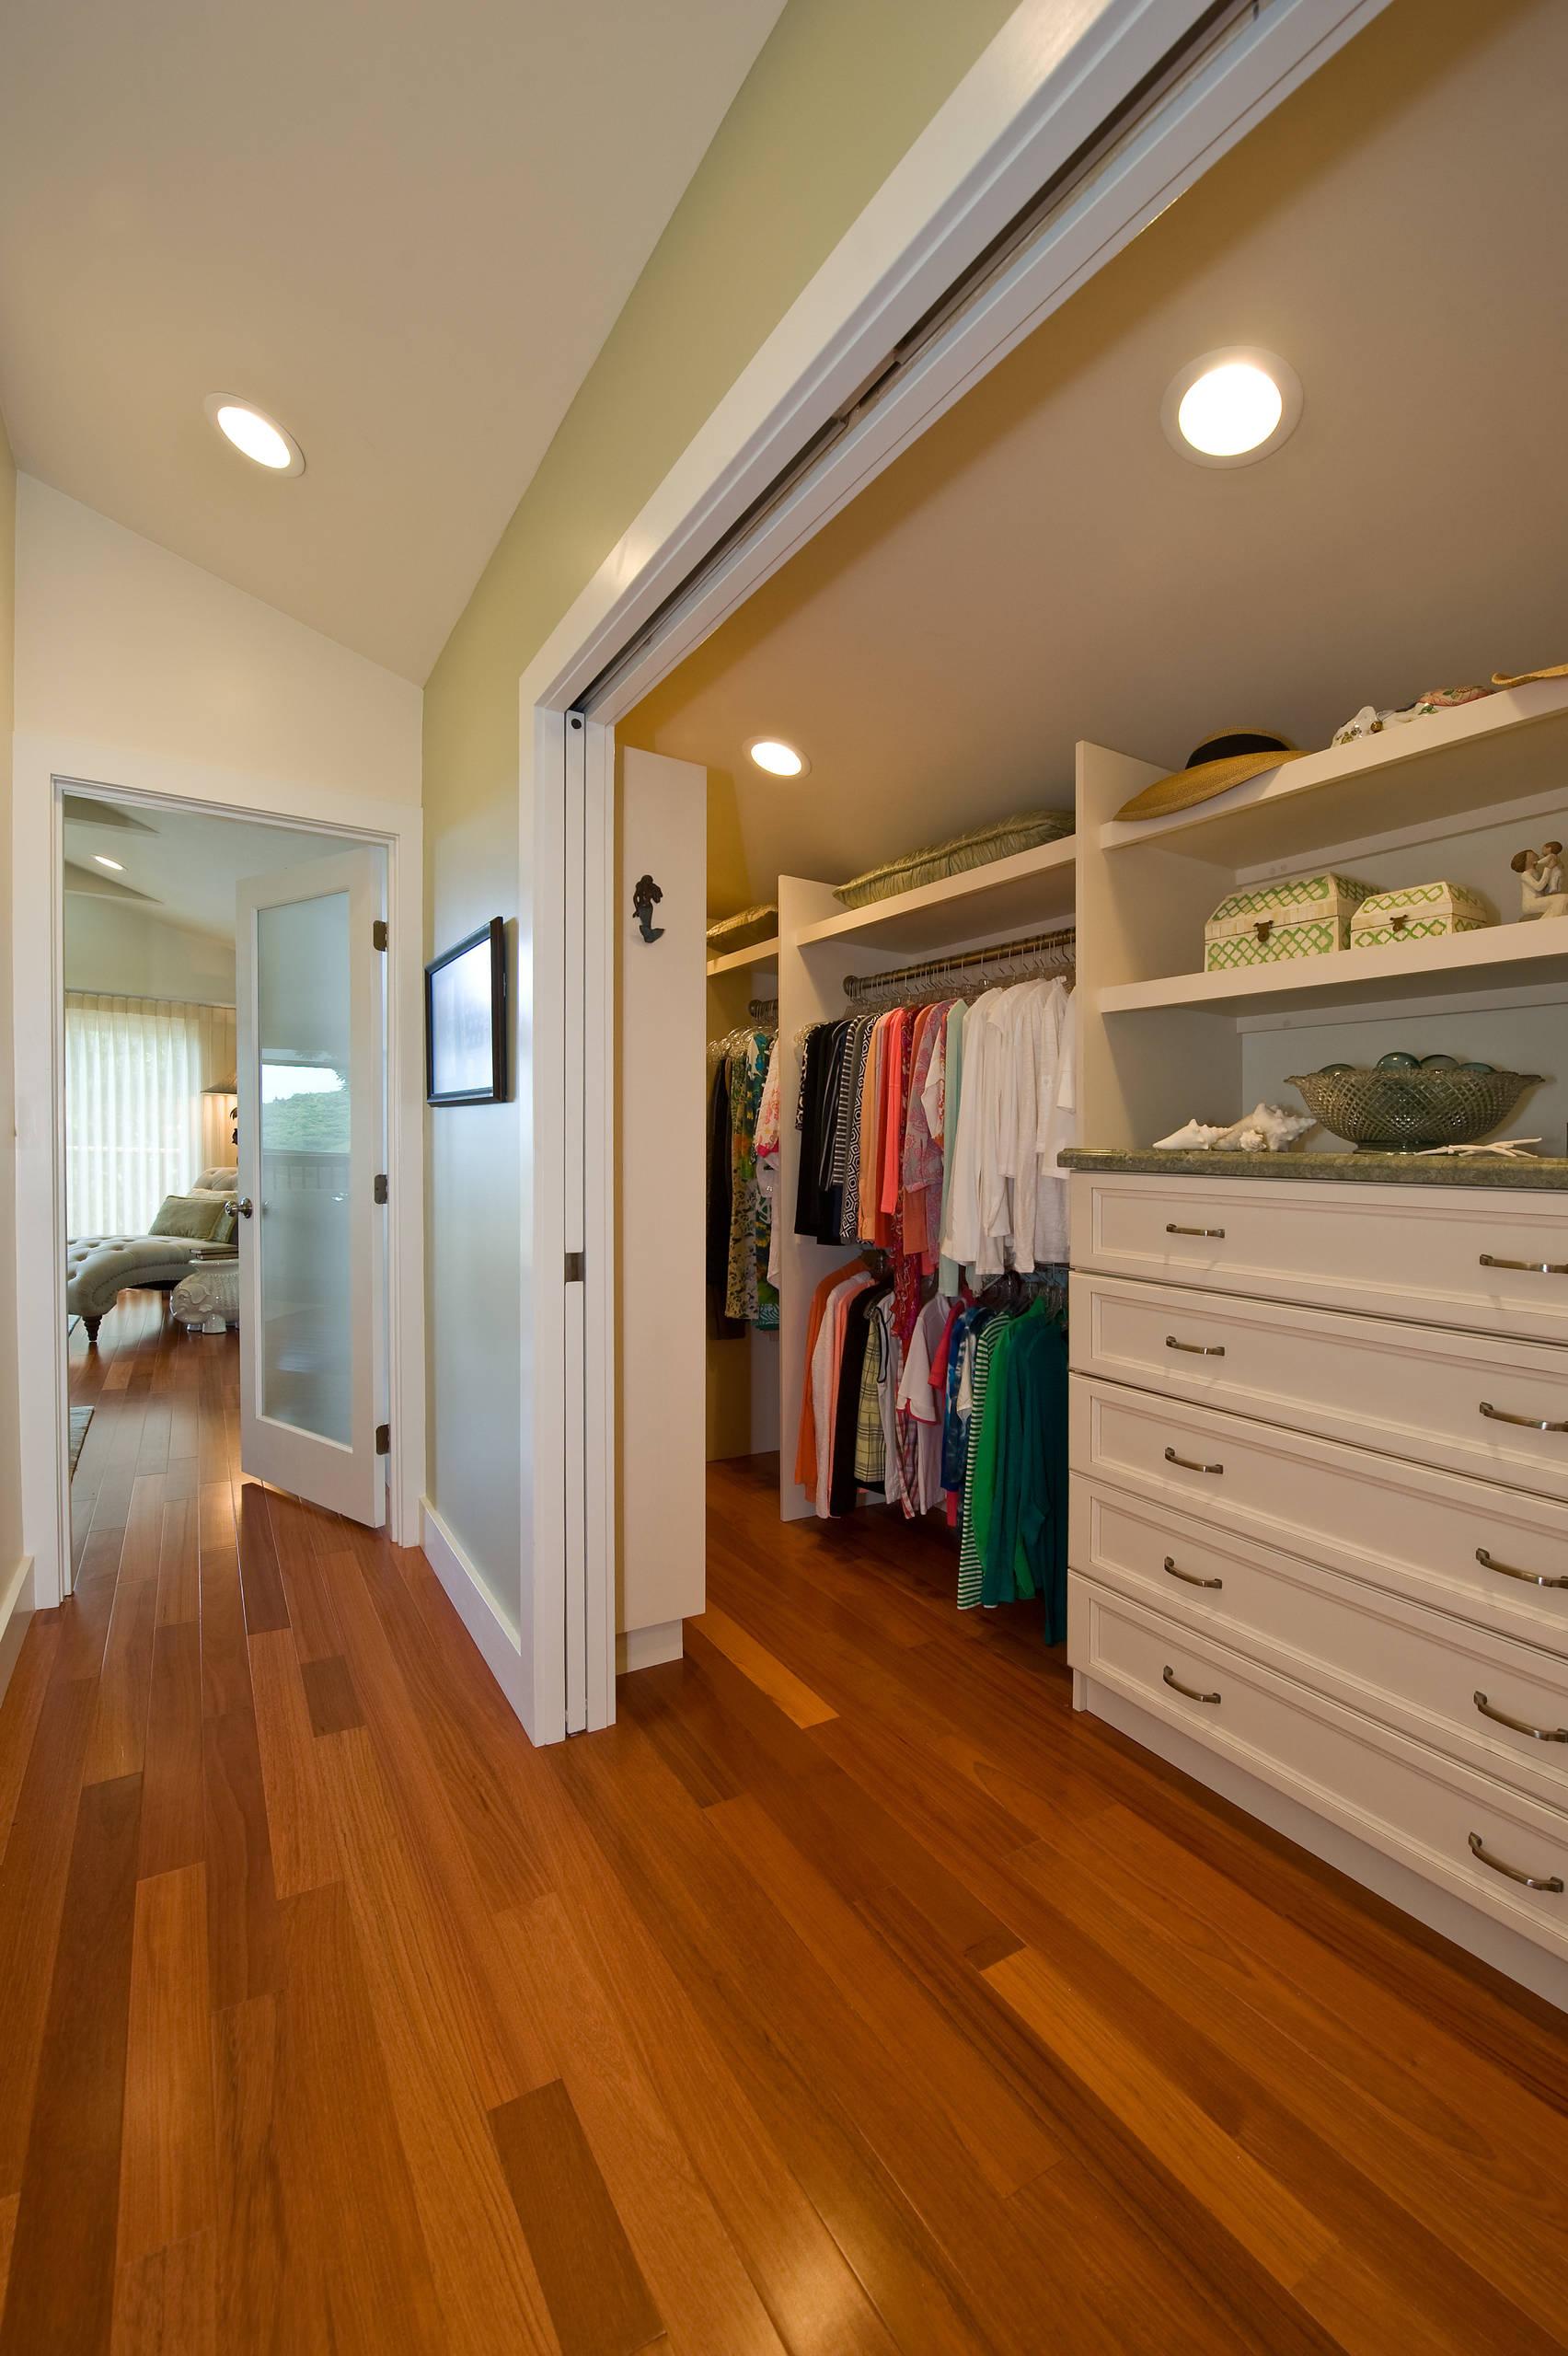 999 Beautiful Walk In Closet Pictures Ideas October 2020 Houzz